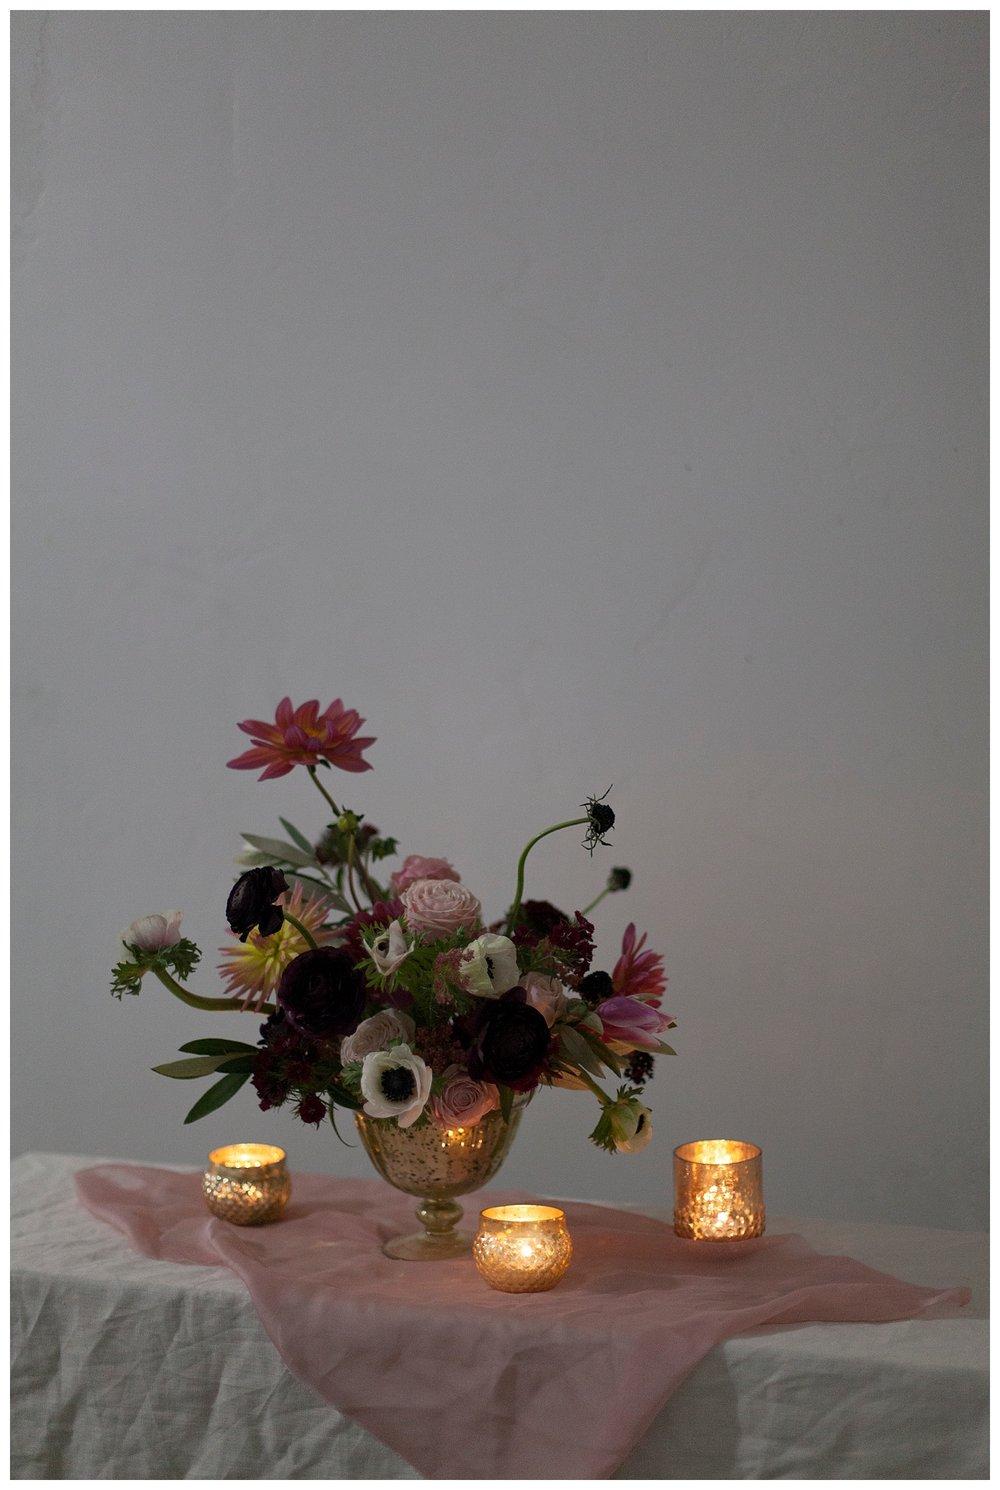 Blush and Berry Wedding Flower Centerpiece